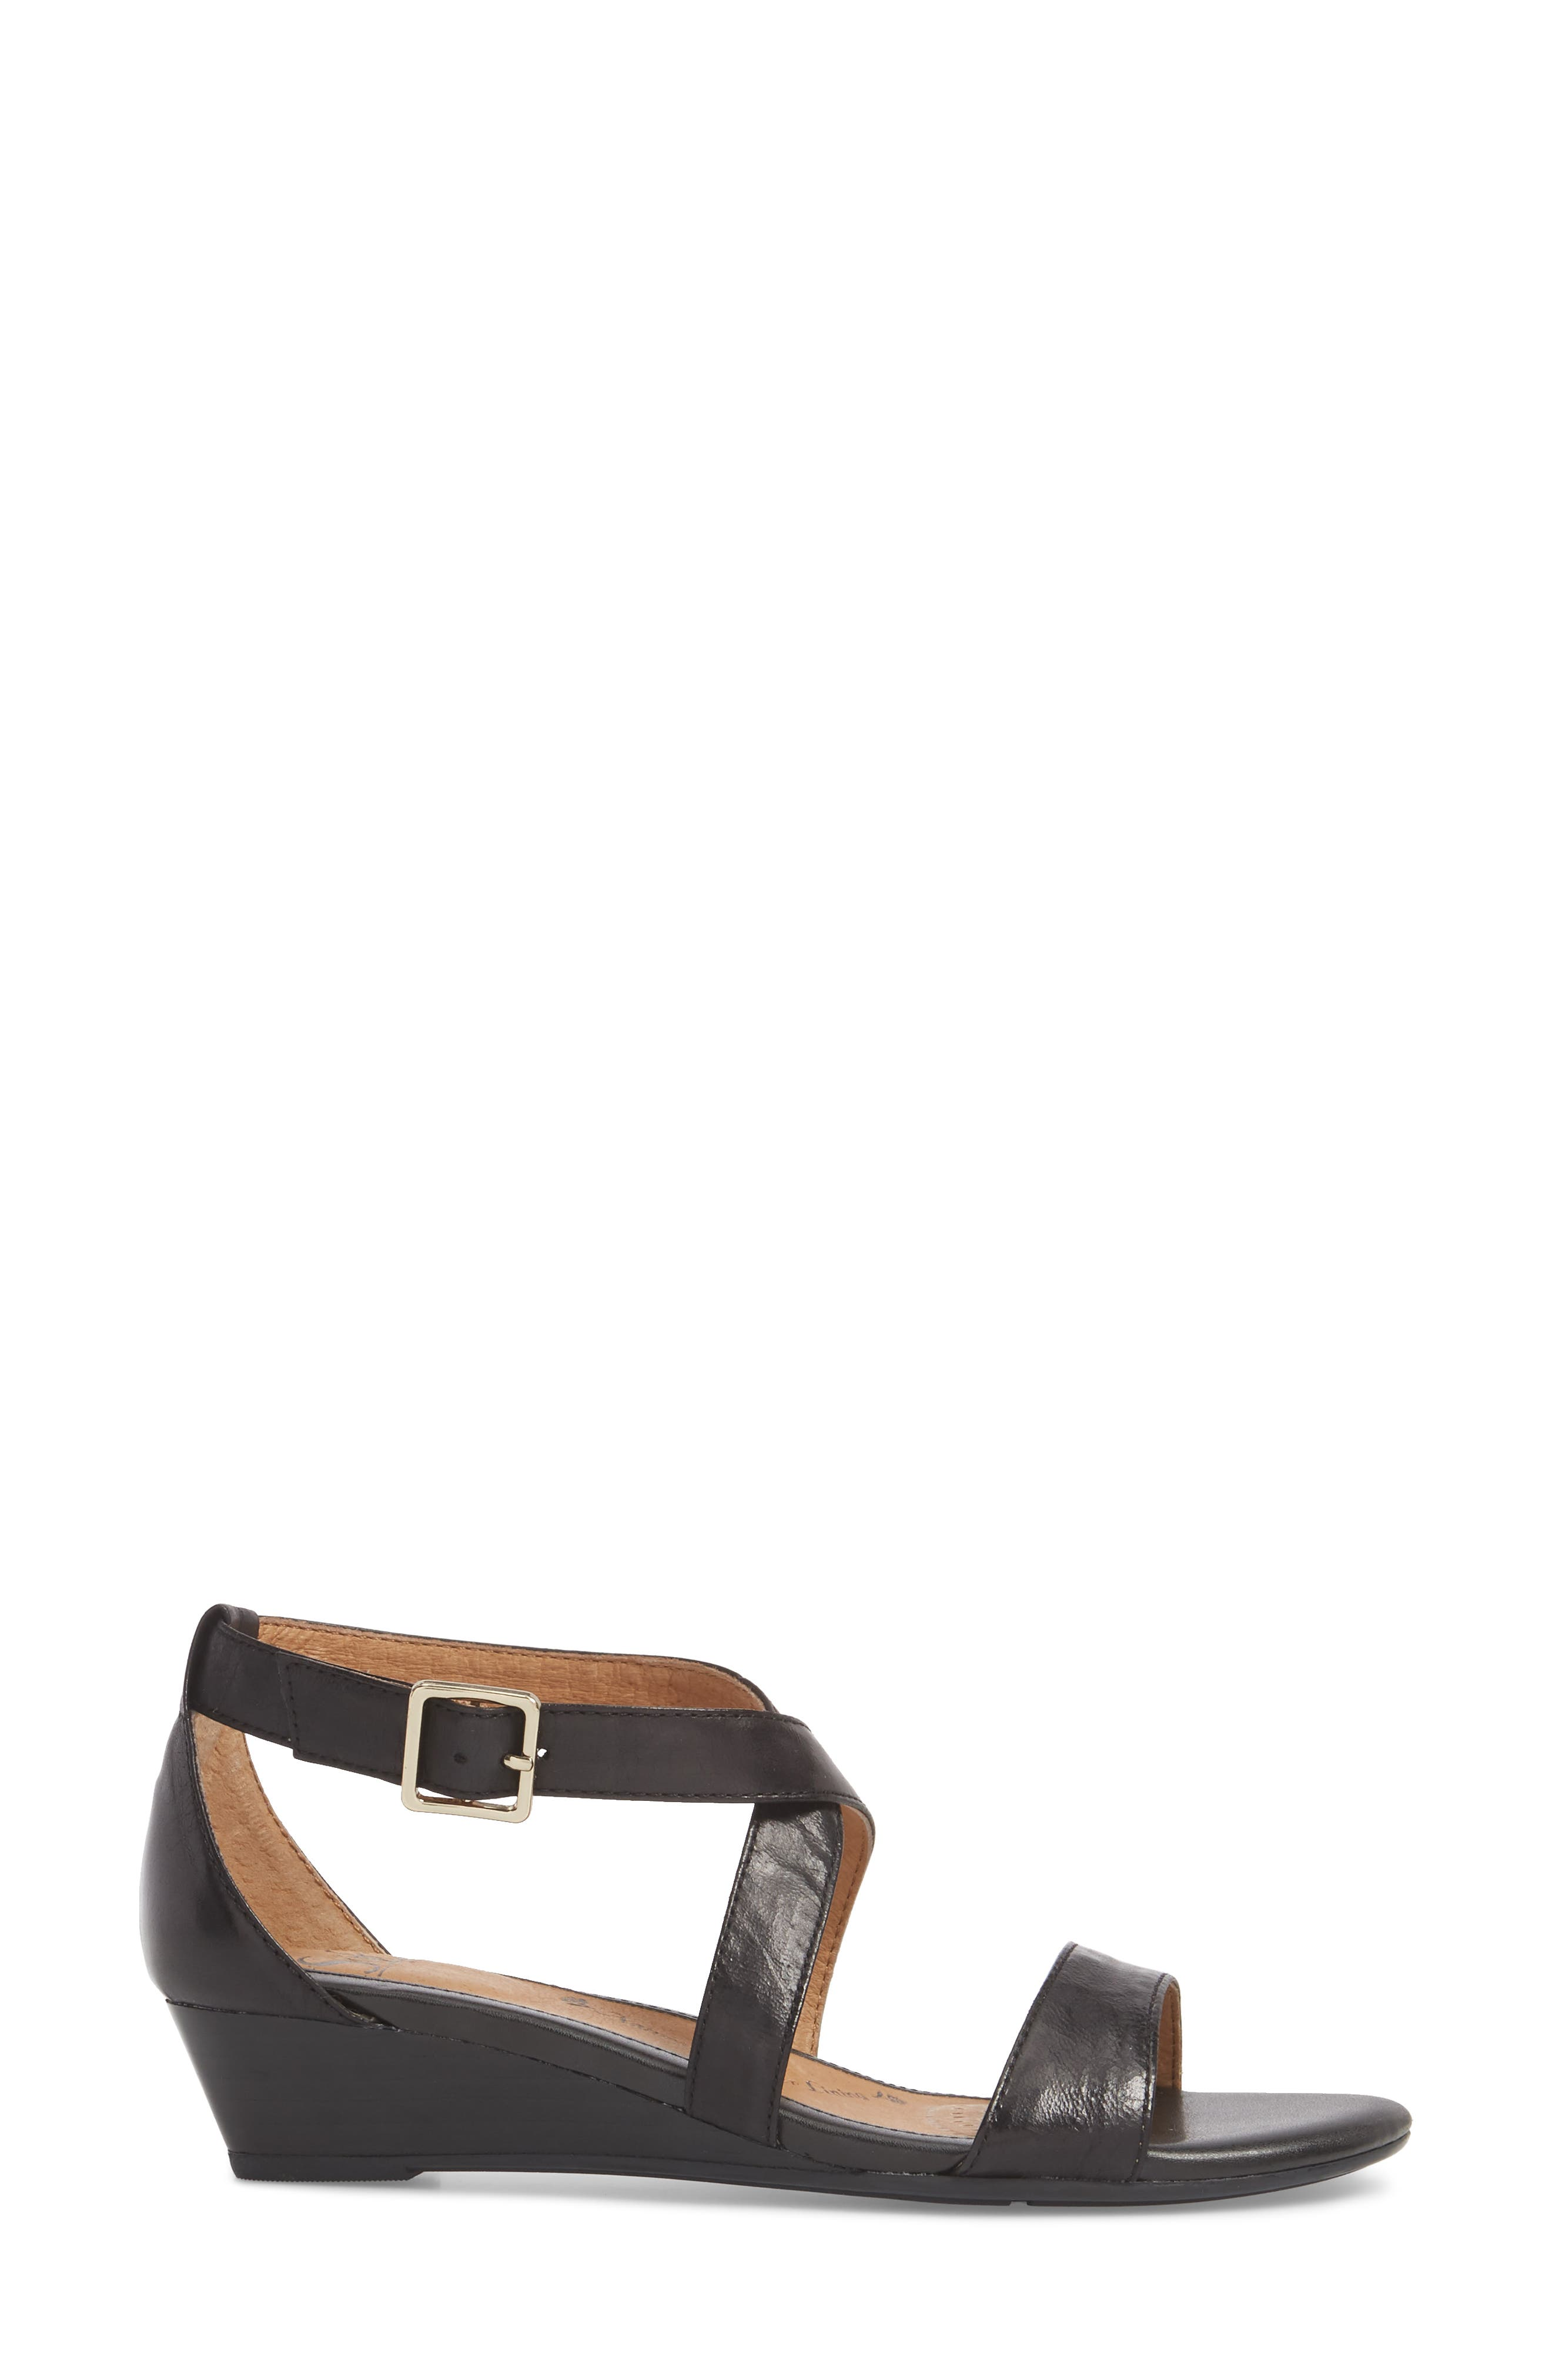 'Innis' Low Wedge Sandal,                             Alternate thumbnail 3, color,                             Black Leather